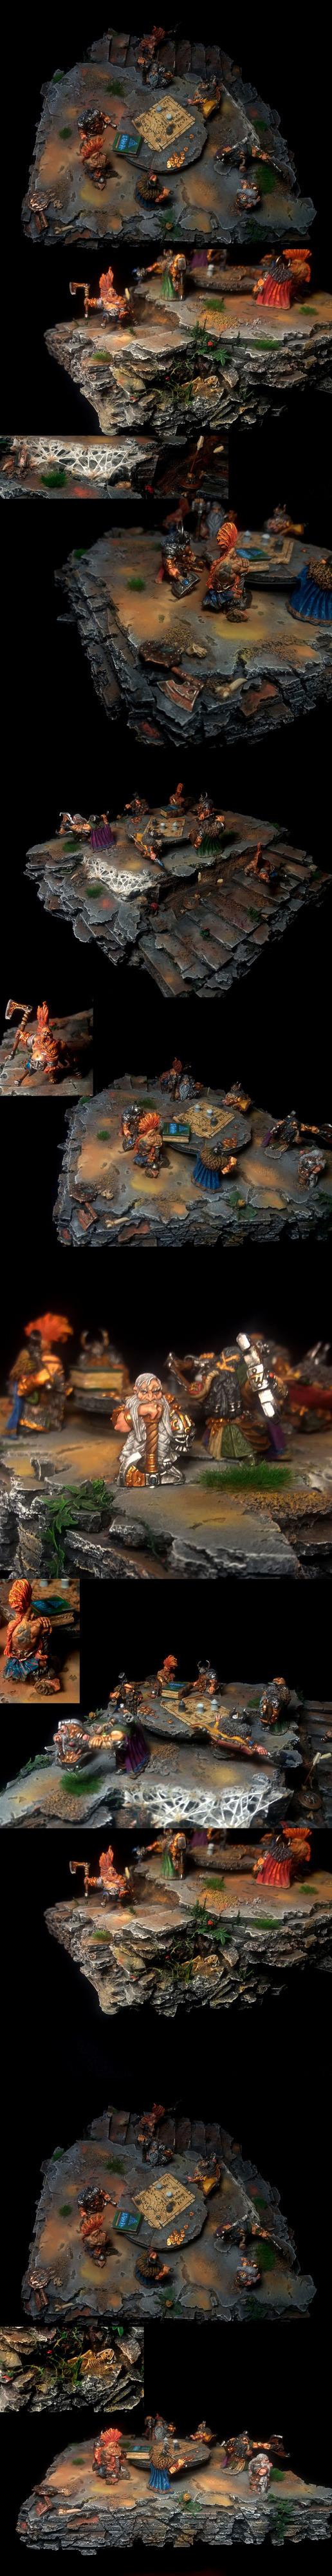 gnomes council